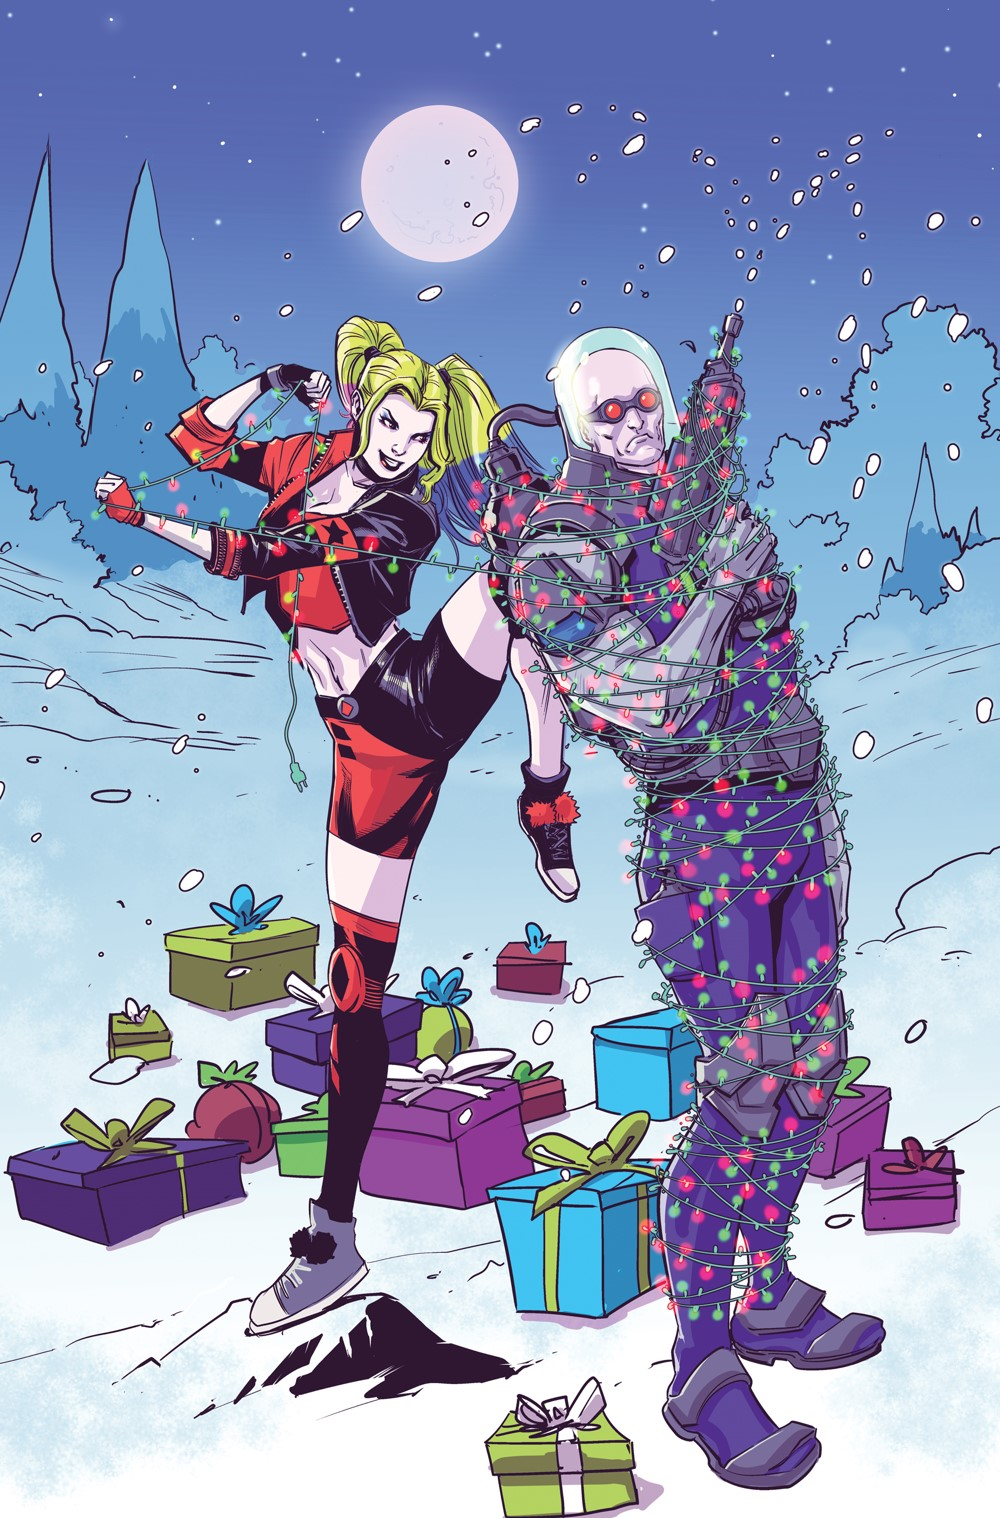 Tis_The_Season_Variant DC Comics November 2021 Solicitations